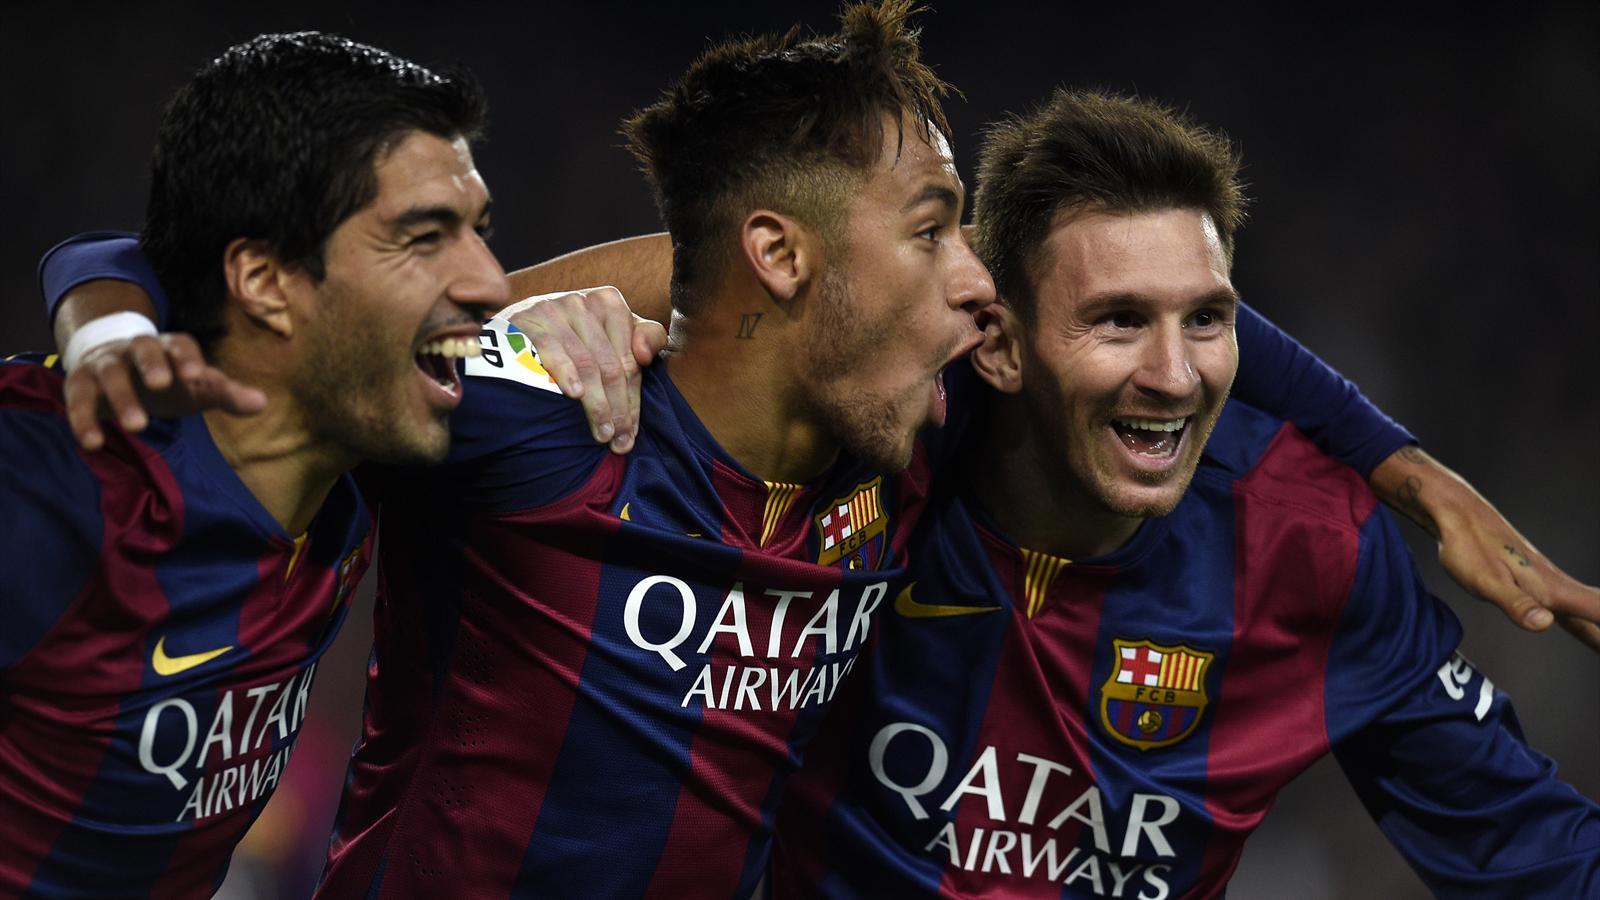 Opponent team fan spat in Lionel Messi 12/21/2015 84